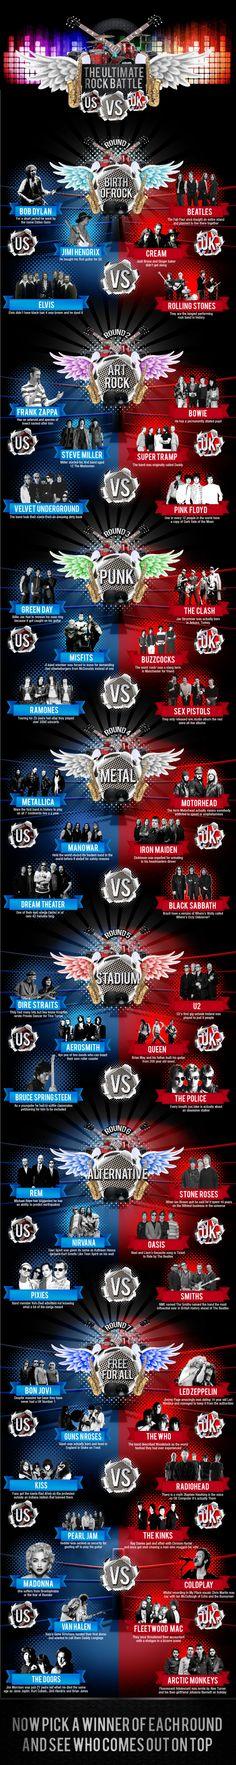 Ultimate Rock Battle US Vs UK   #Infographic #RockBands #USA #UK #Music